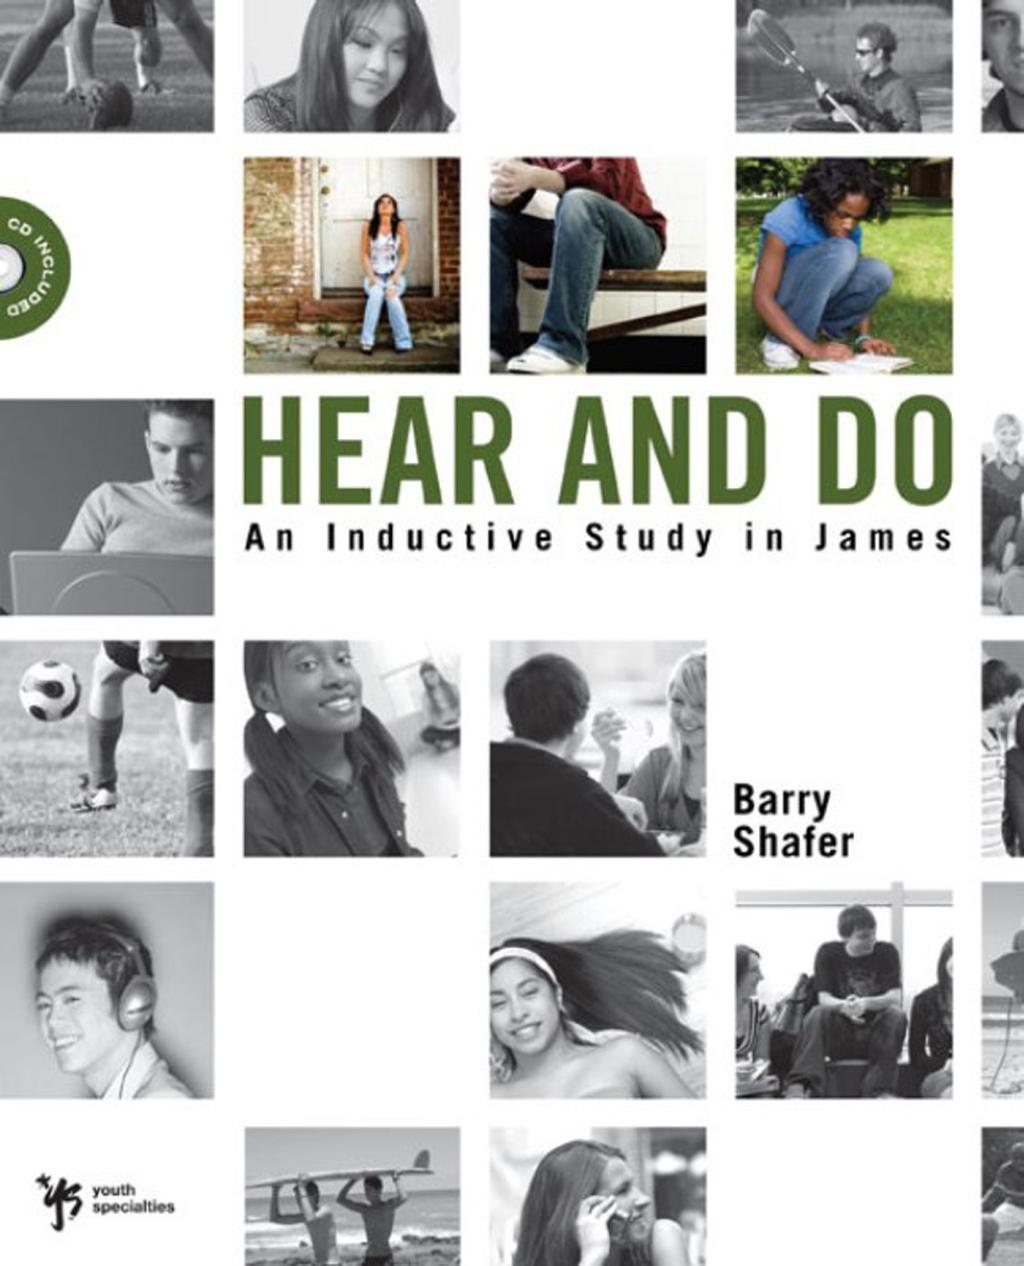 Hear and Do